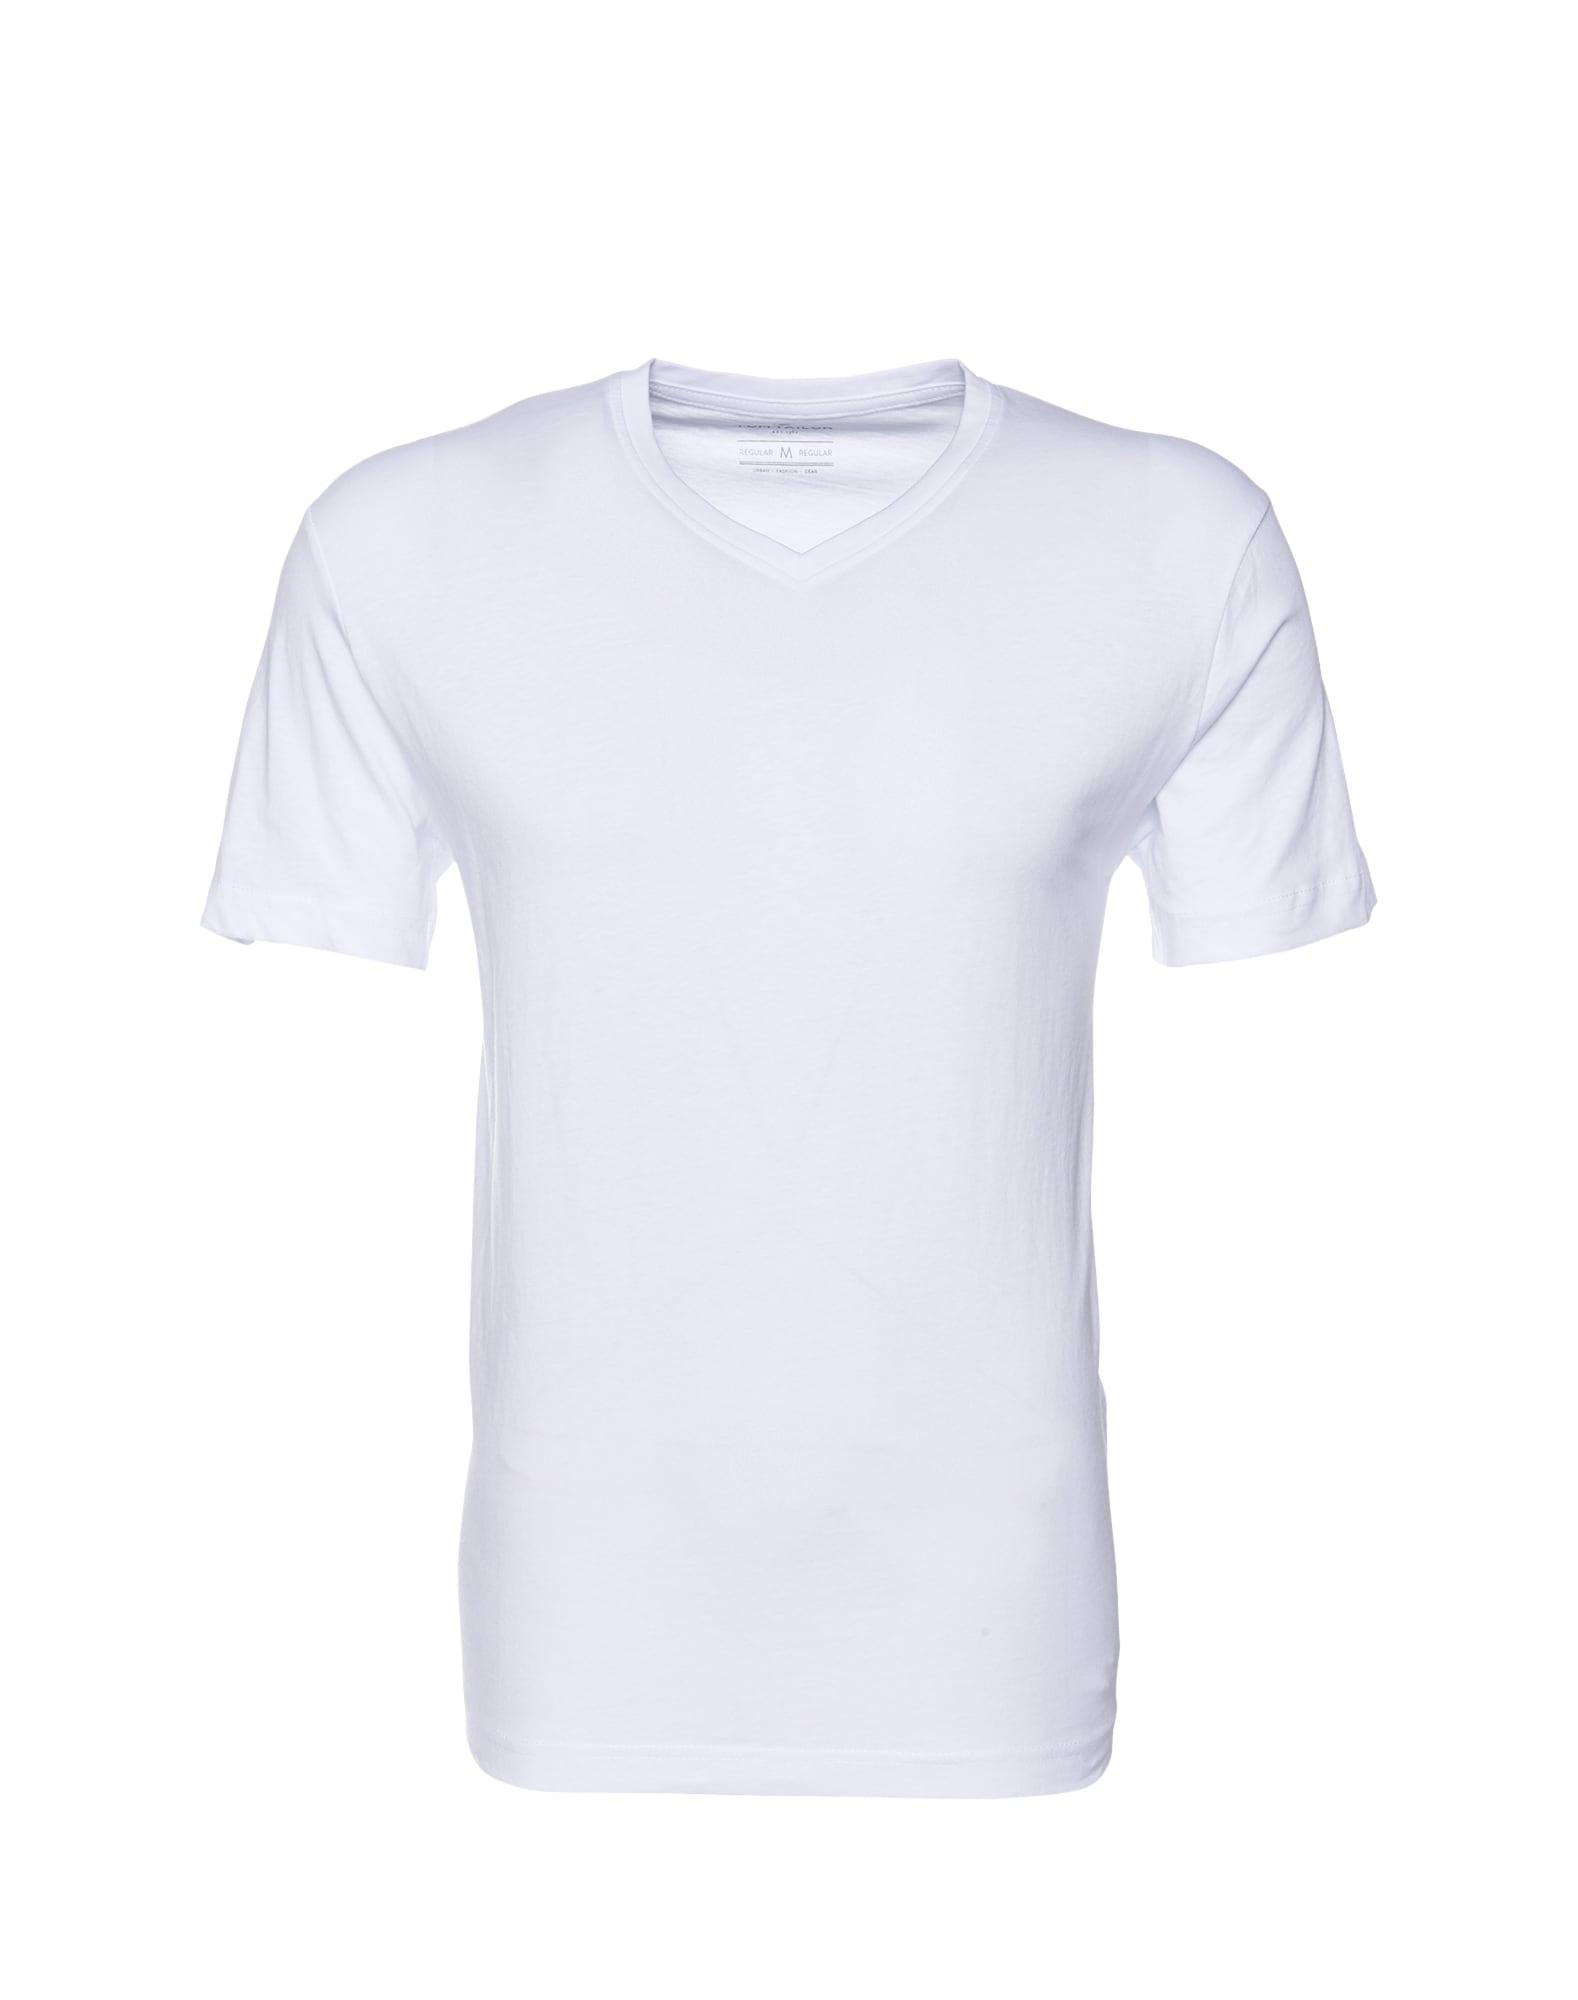 TOM TAILOR, Heren Shirt, wit